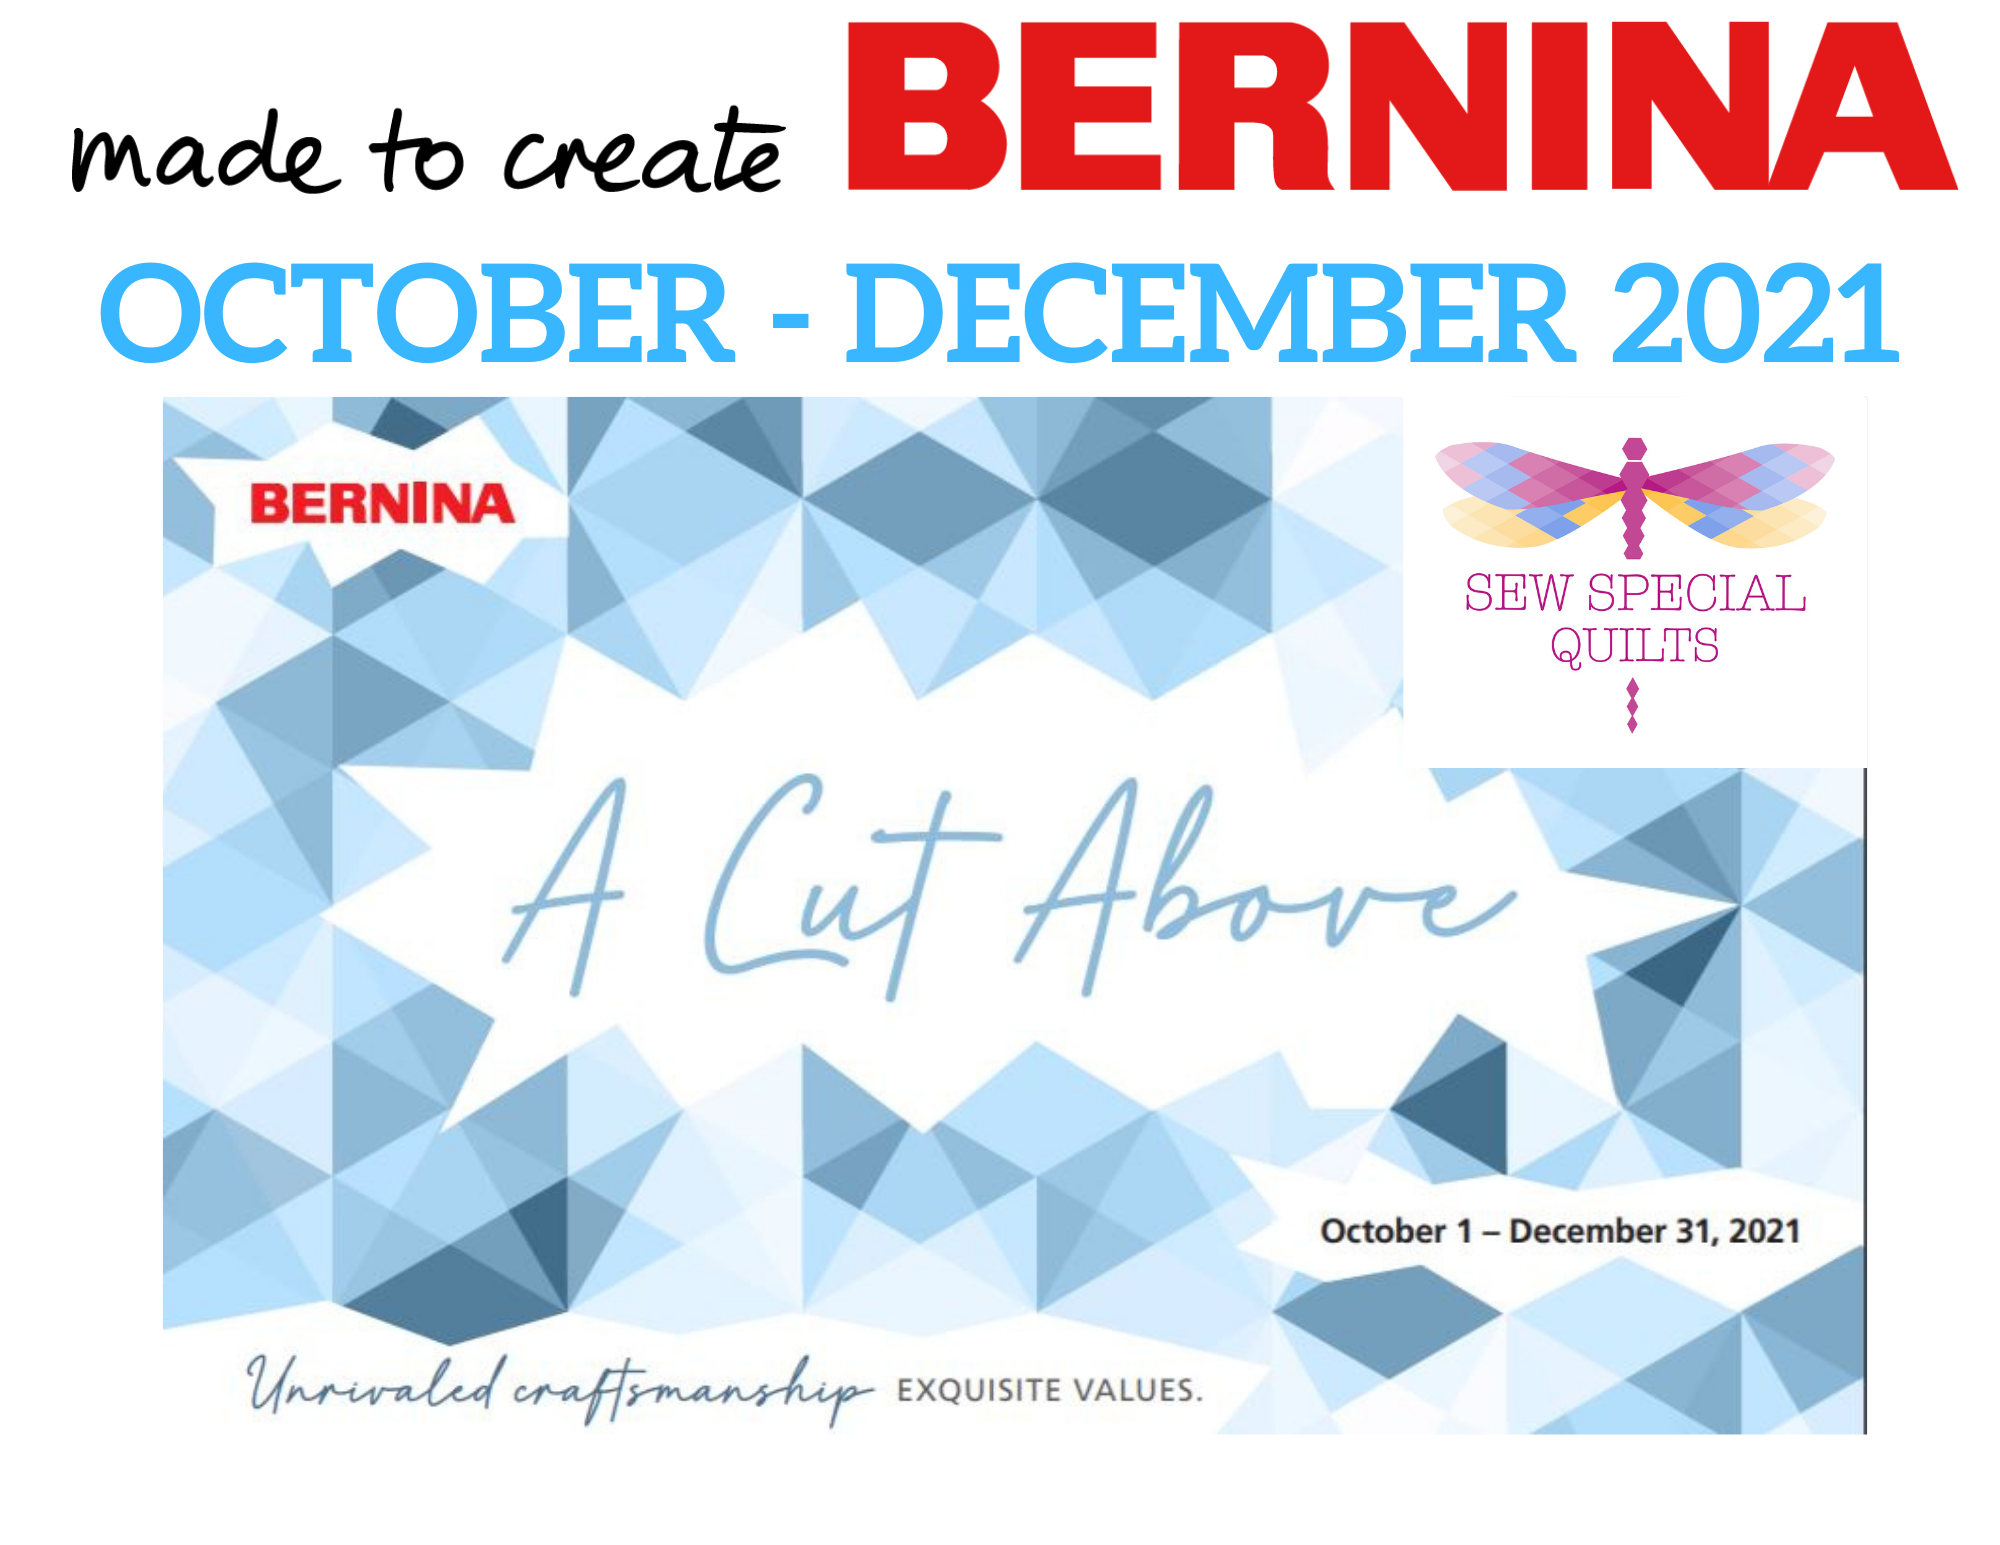 Holiday BERNINA Promotions